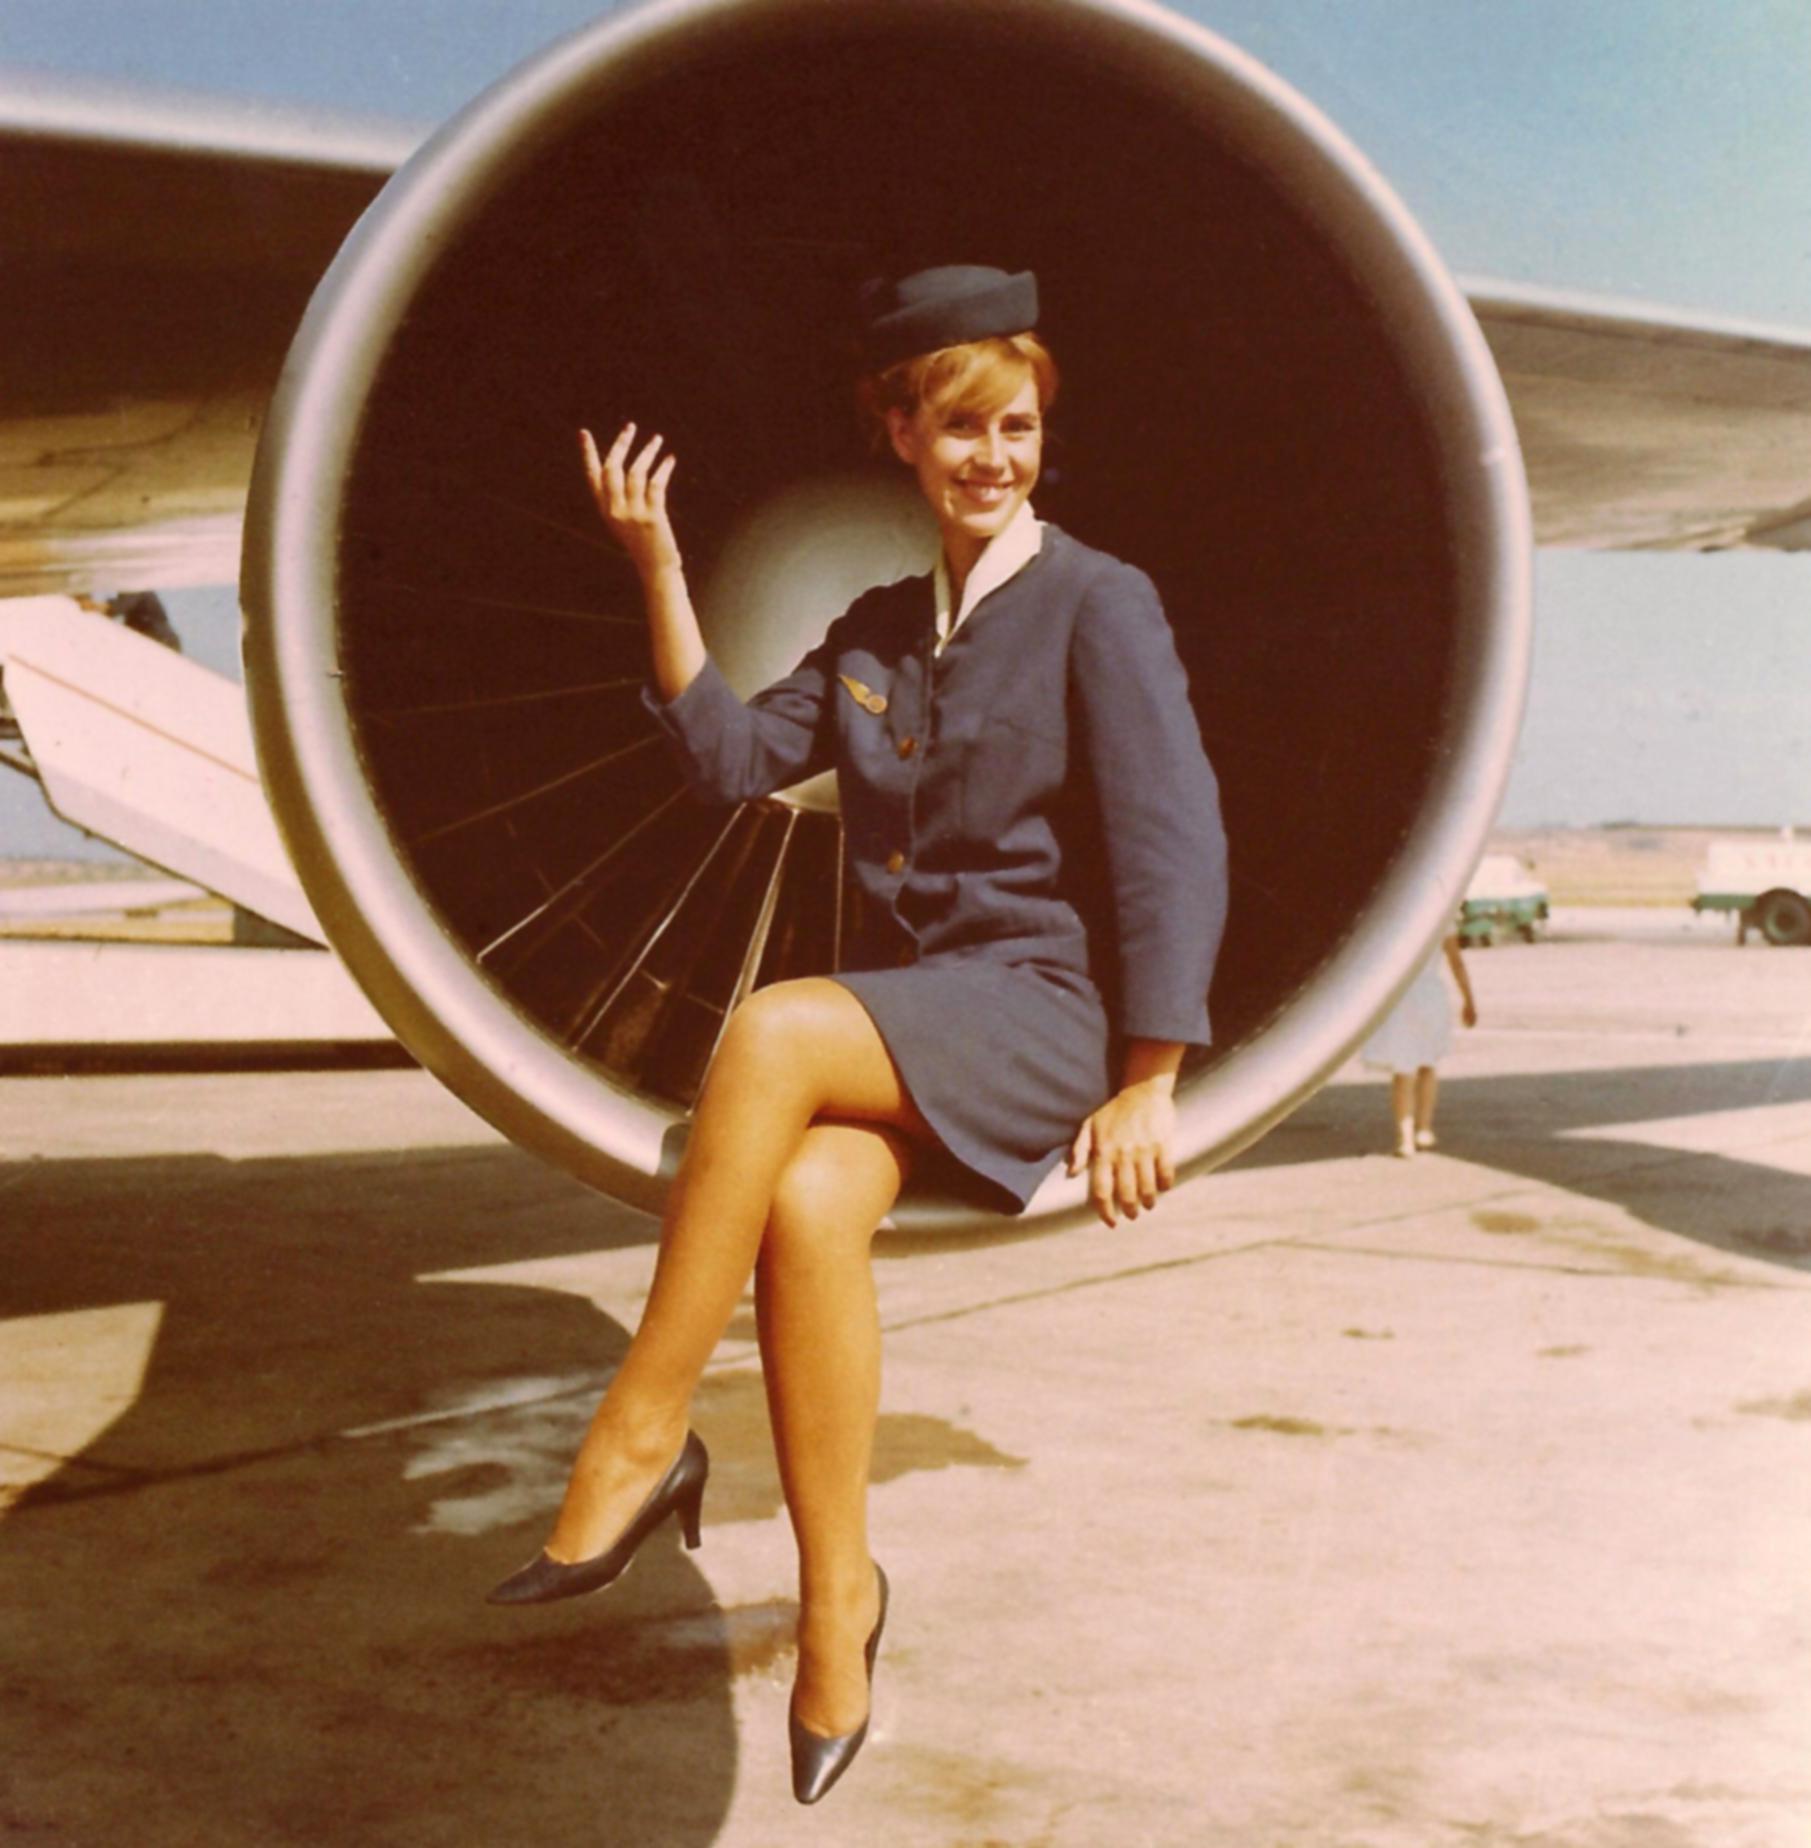 A/B Margarida Rouillé com 6.º uniforme da TAP, Aeroporto da Portela, 1968 (D. Vacchi, Museu da TAP, 122FOTG)